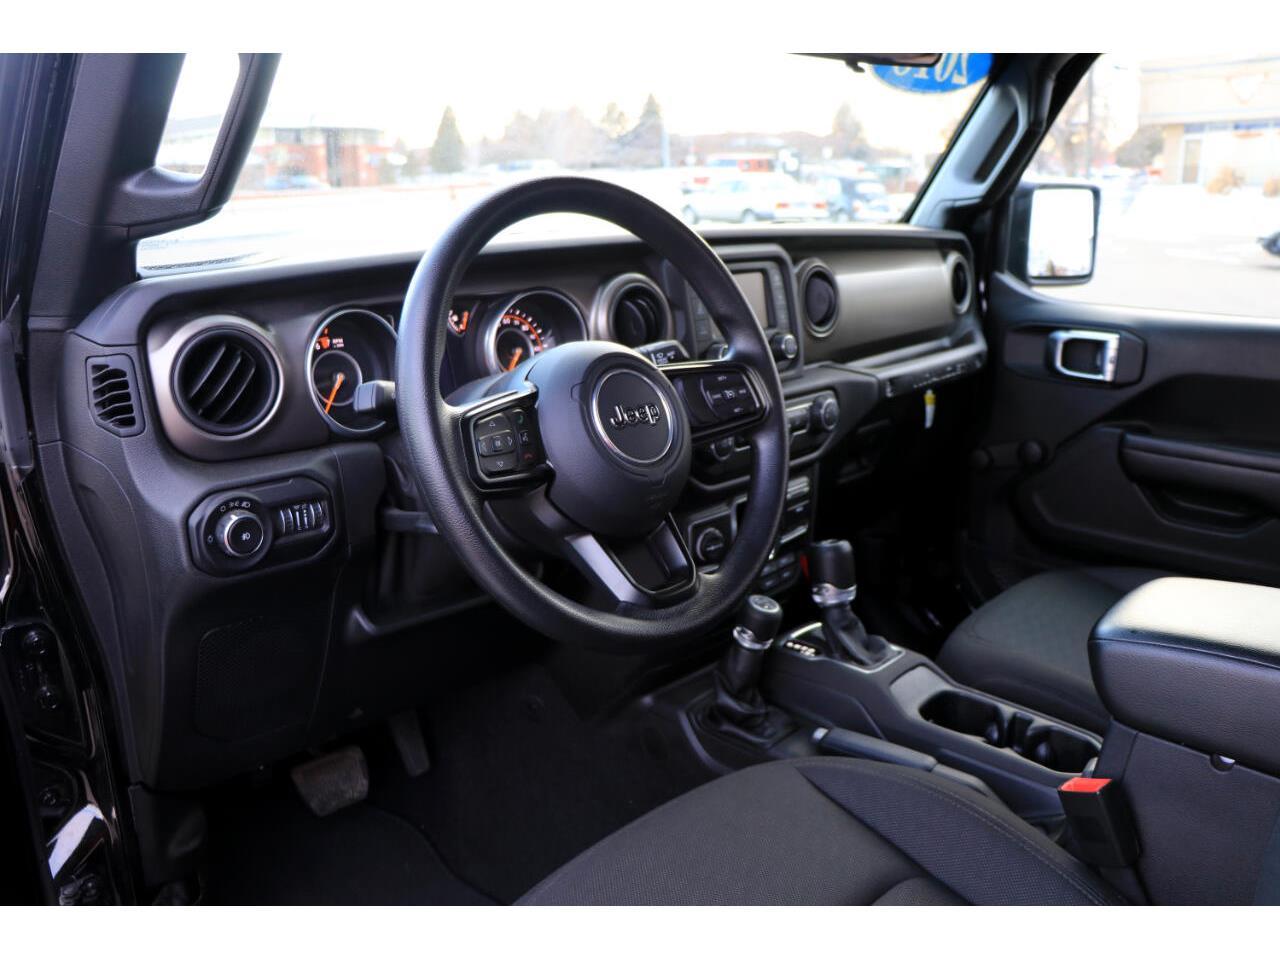 2018 Jeep Wrangler (CC-1320475) for sale in Greeley, Colorado